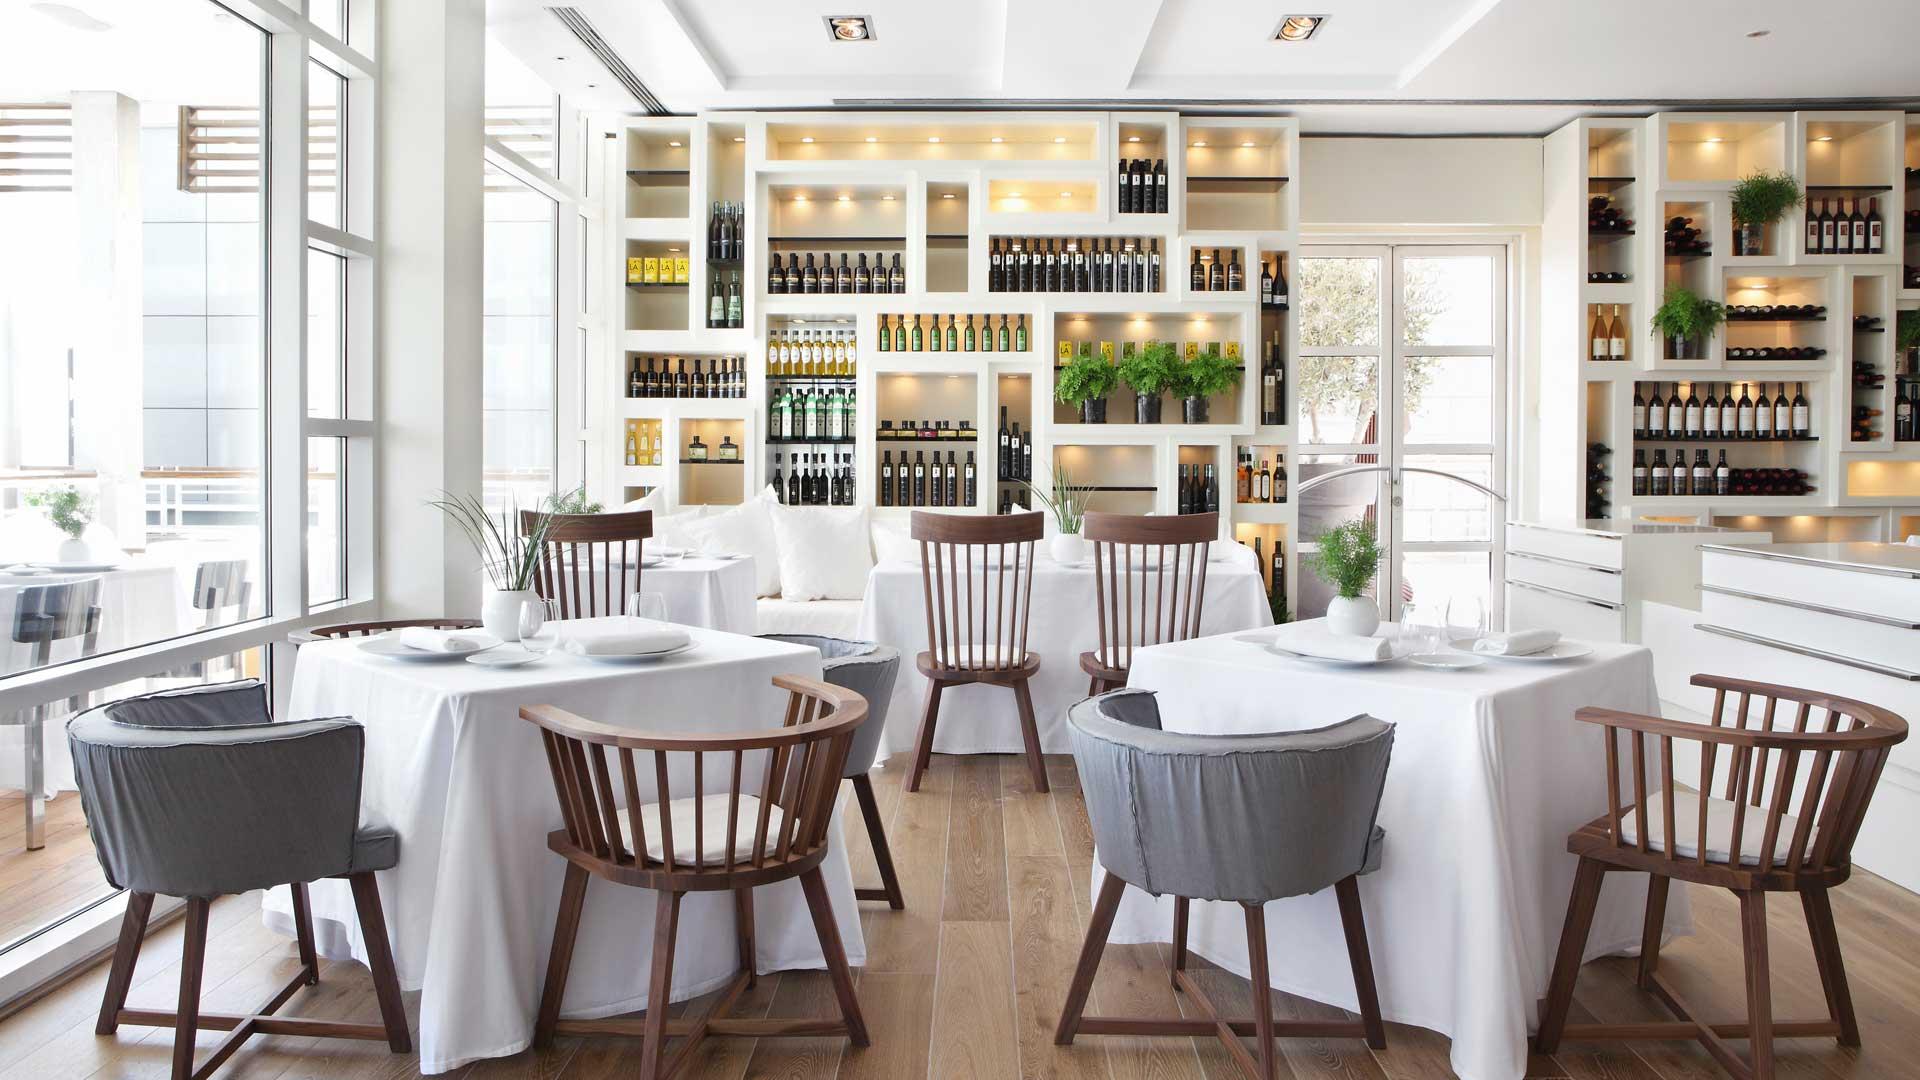 Hotel arts barcelona website thomas manss company - Restaurant umo barcelona ...